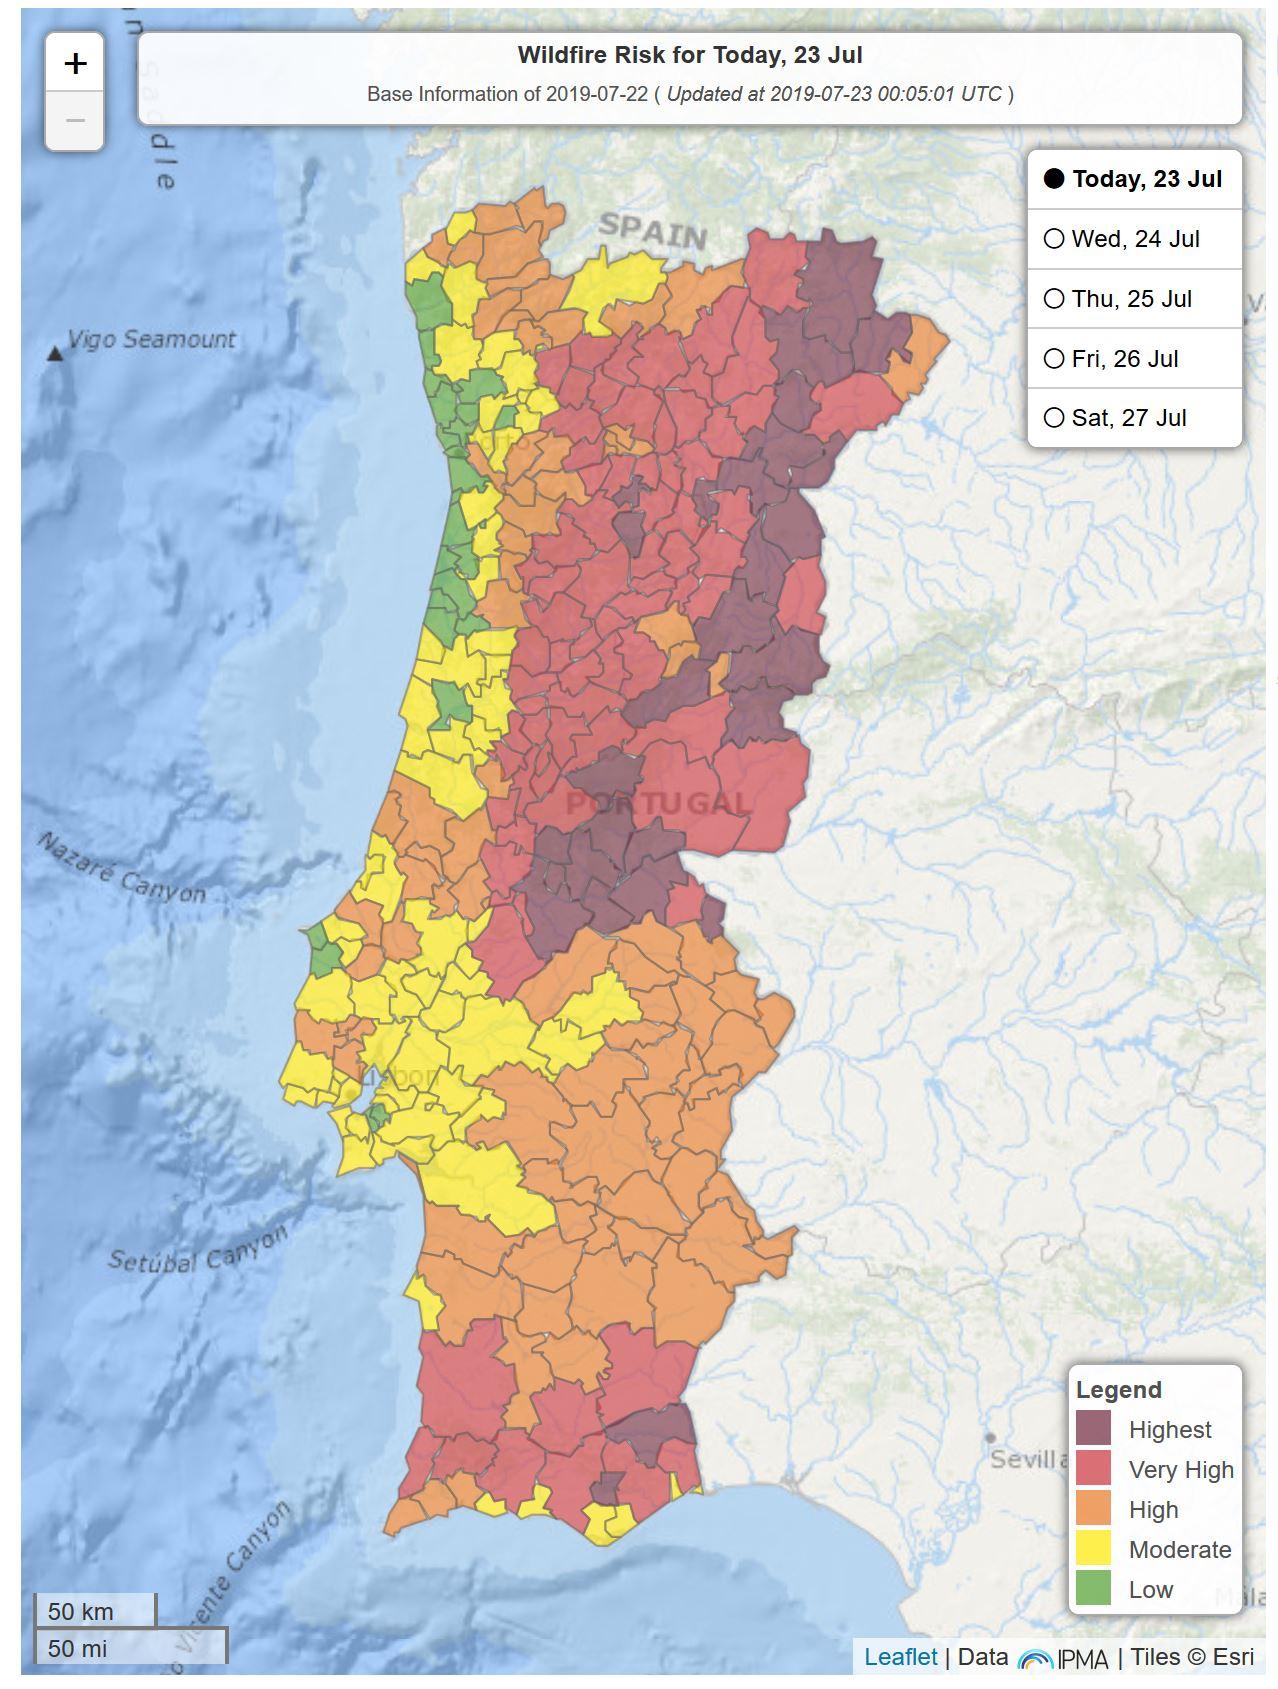 Portugal Kampft Schon Vier Tage Gegen Die Waldbrande Algarve Fur